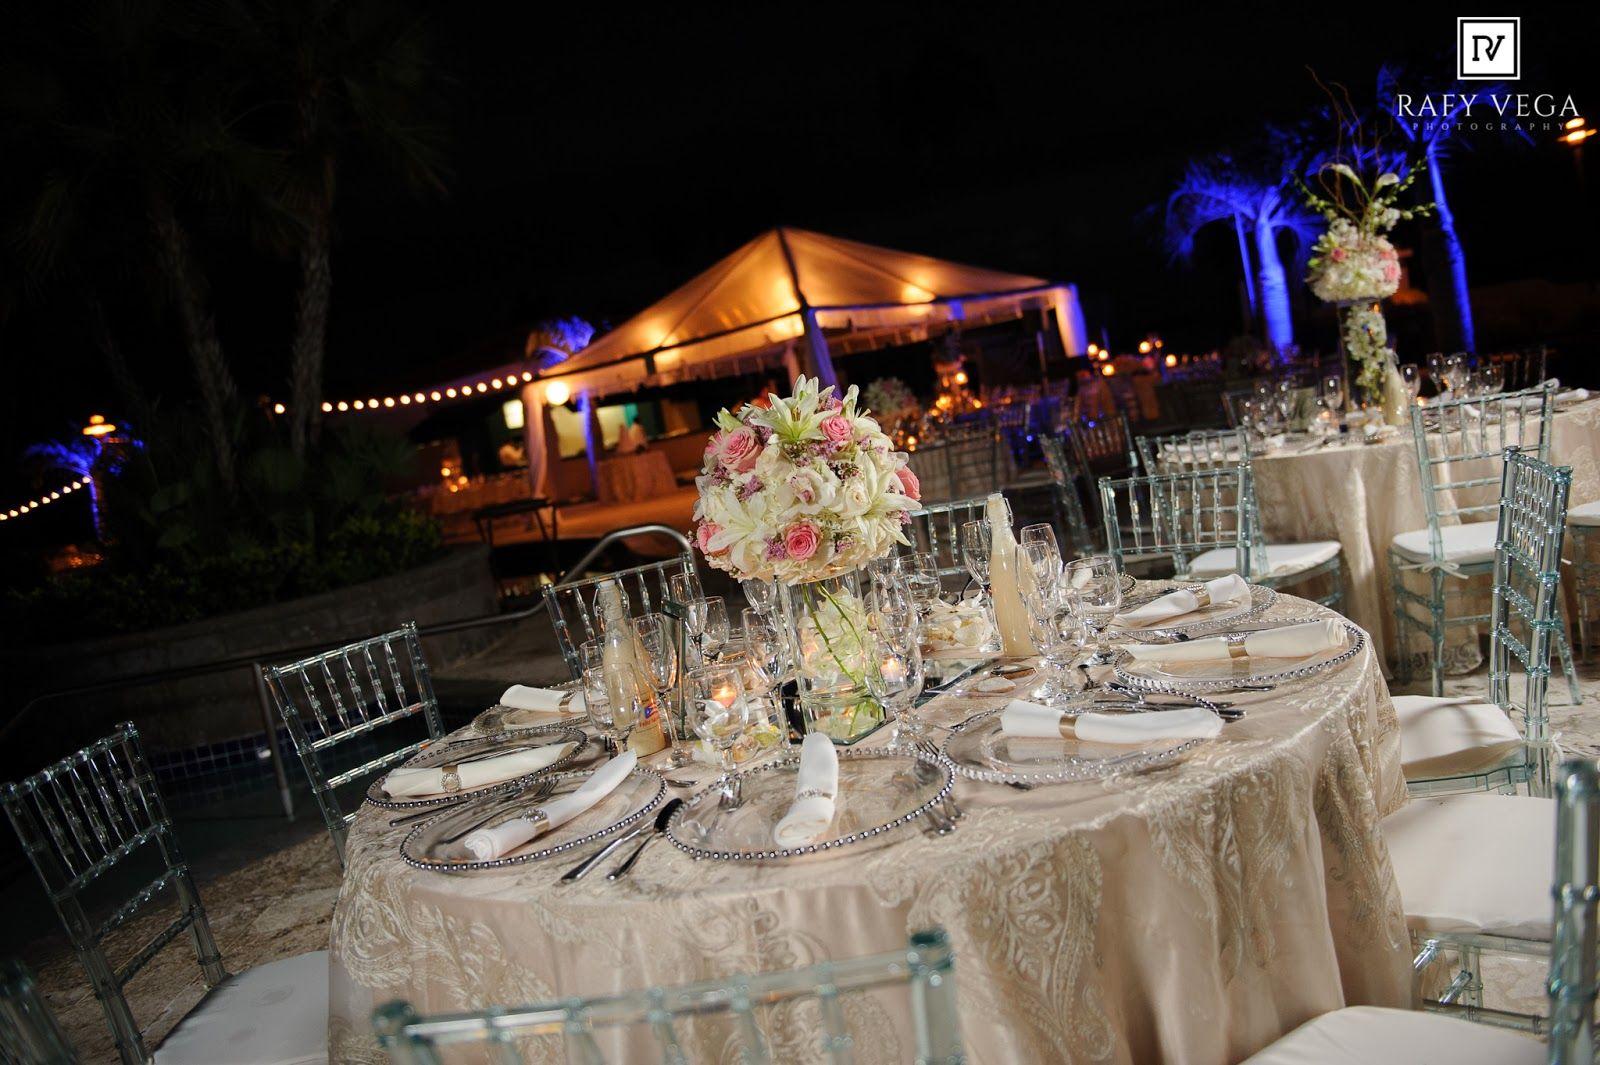 Rafy Vega Photography Fotografo De Bodas Wedding Photographer Ponce Puerto Rico Crissel Ju Ponce Hilton Hotel Costa Caribe Golf Resort Table